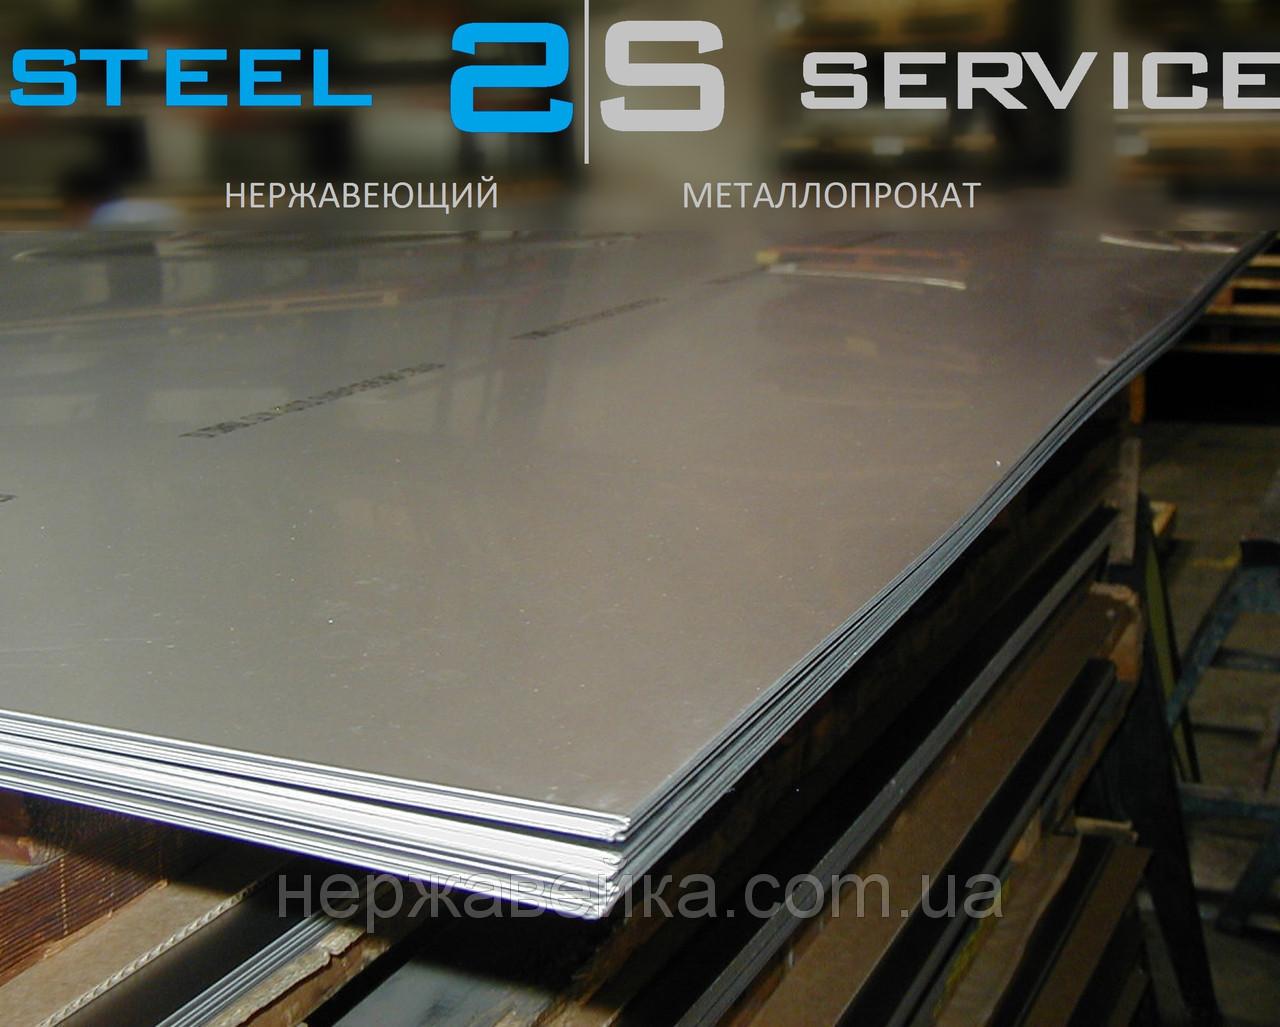 Нержавейка лист 3х1000х2000мм  AISI 316Ti(10Х17Н13М2Т) 2B - матовый,  кислотостойкий